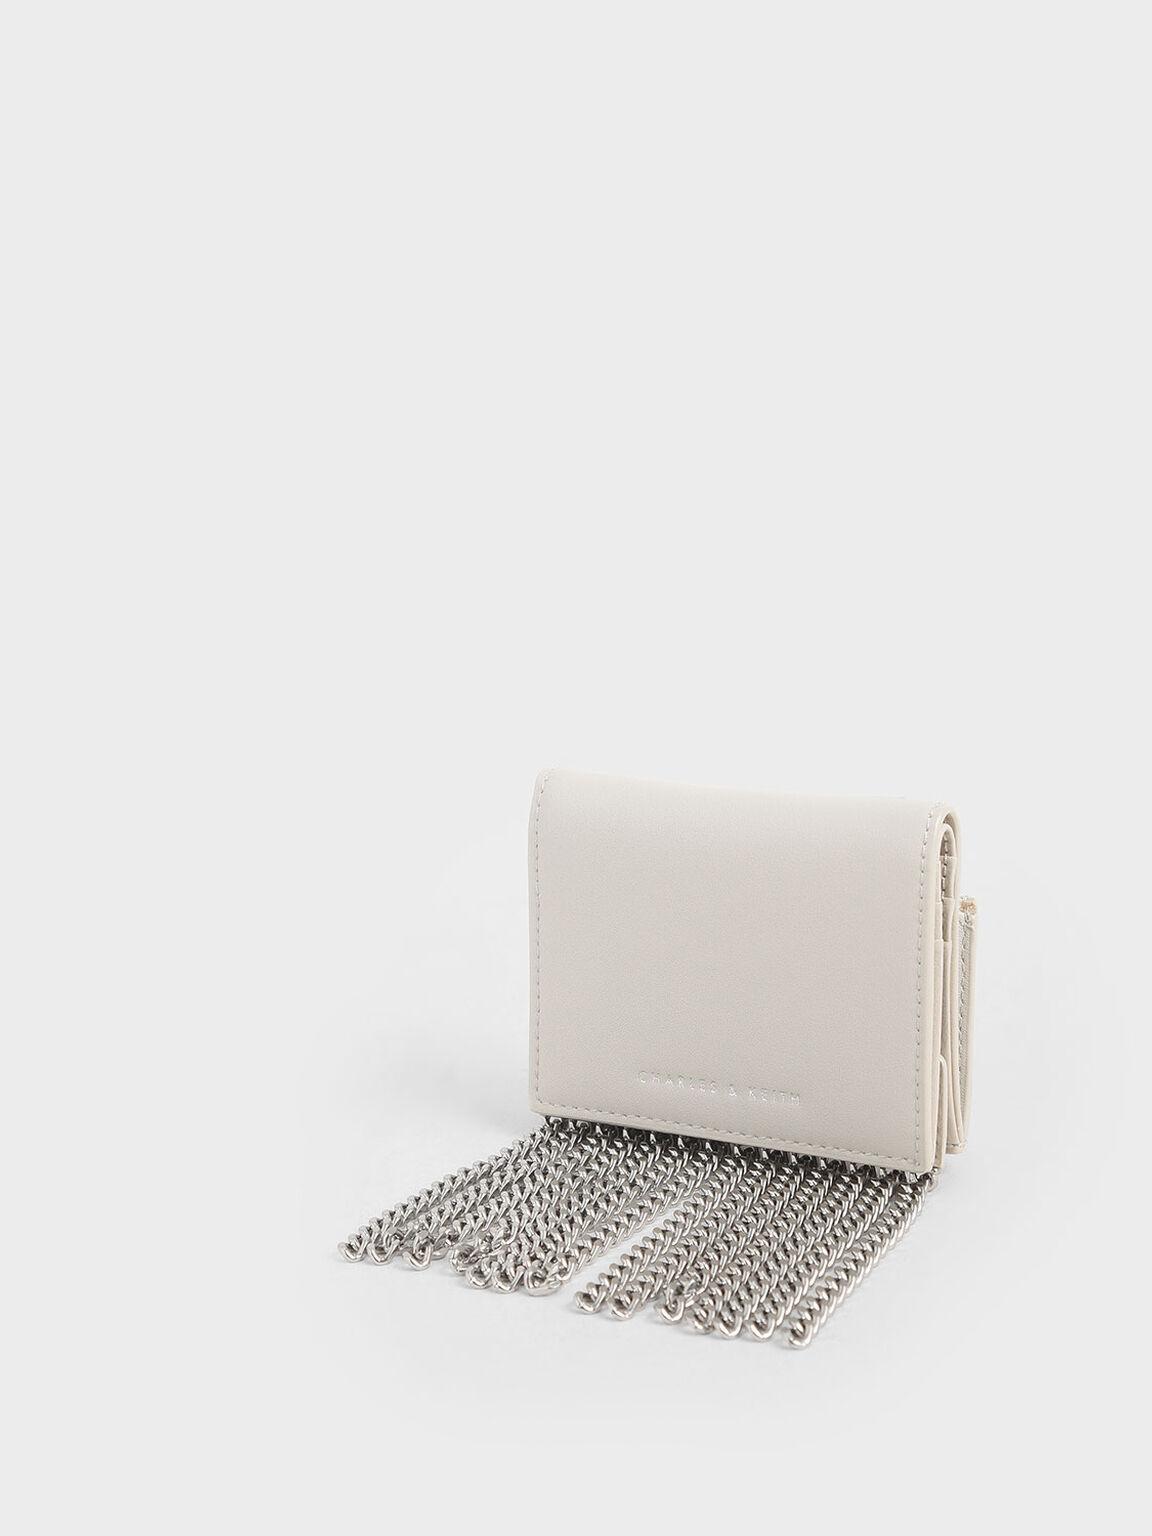 Chain Fringe Card Holder, Cream, hi-res